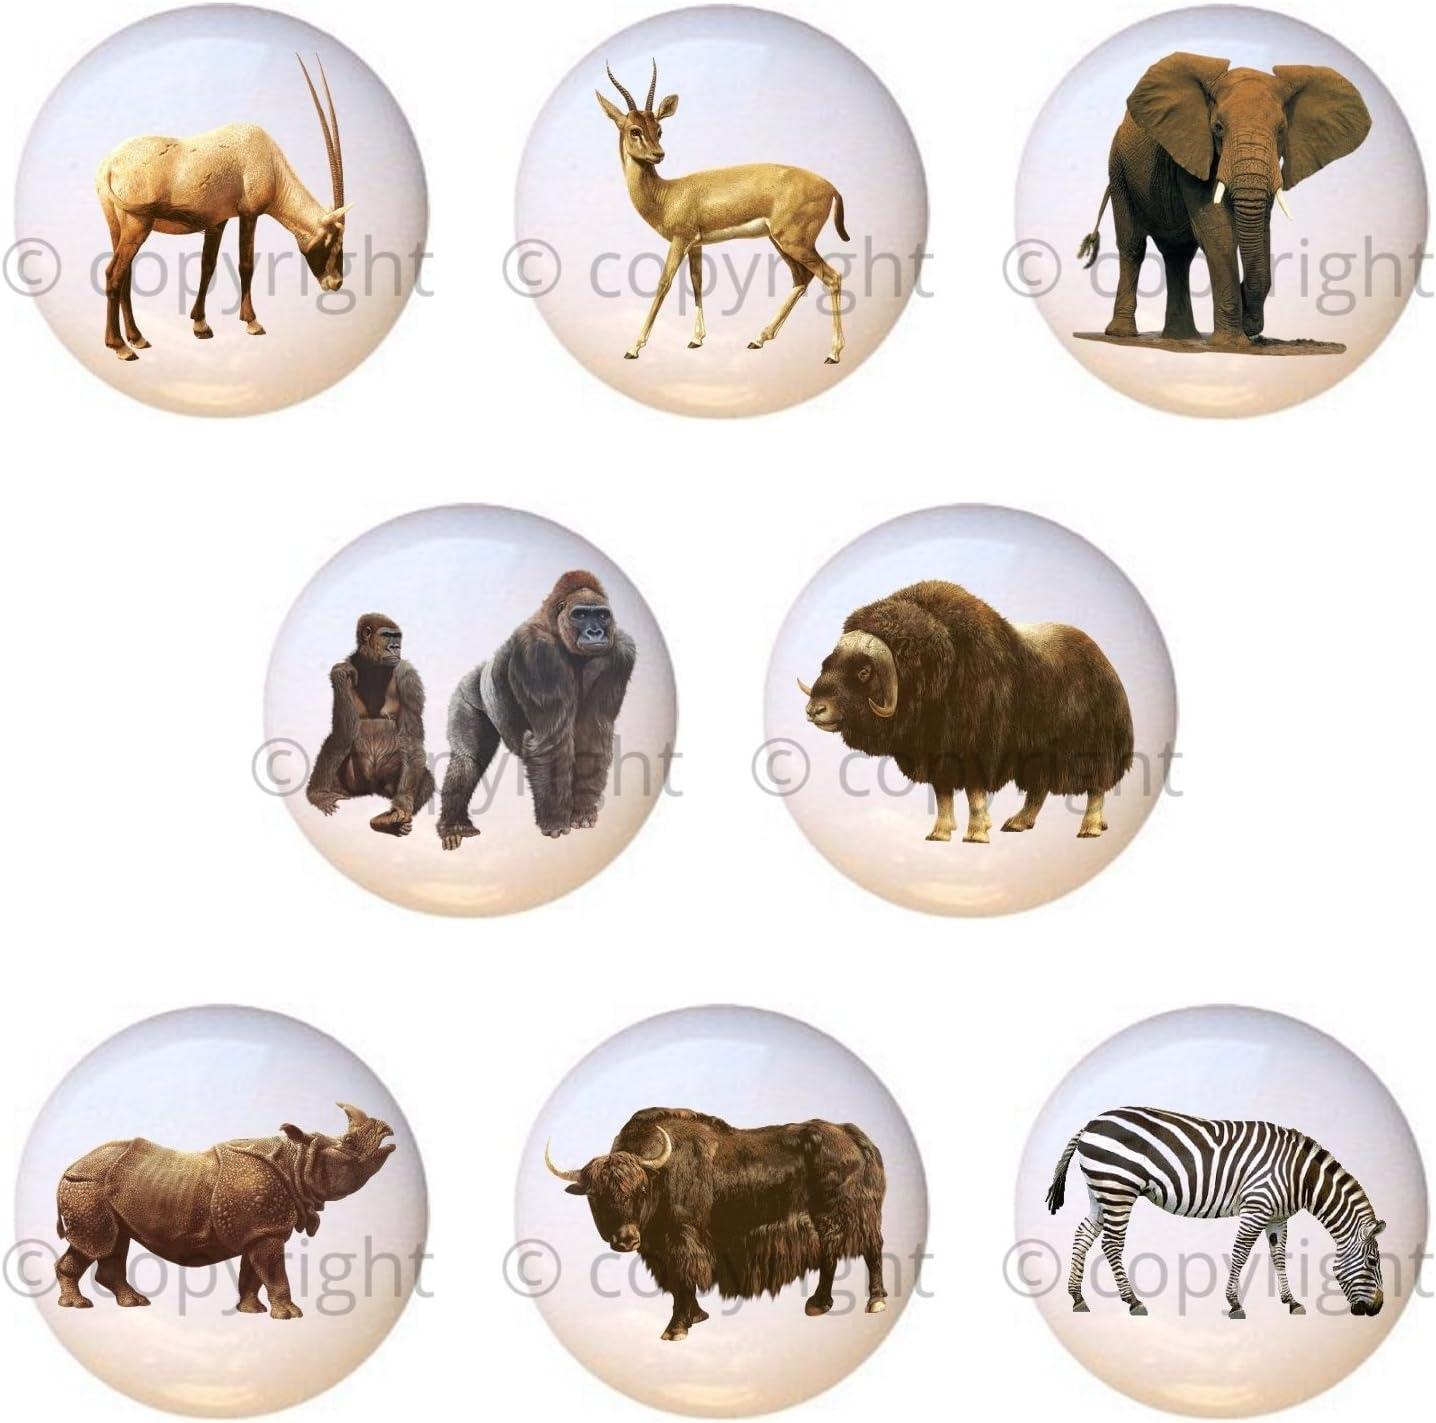 Department store Set of 8 - African Wildlife Drawer Realistic Safari Pu San Jose Mall Animals